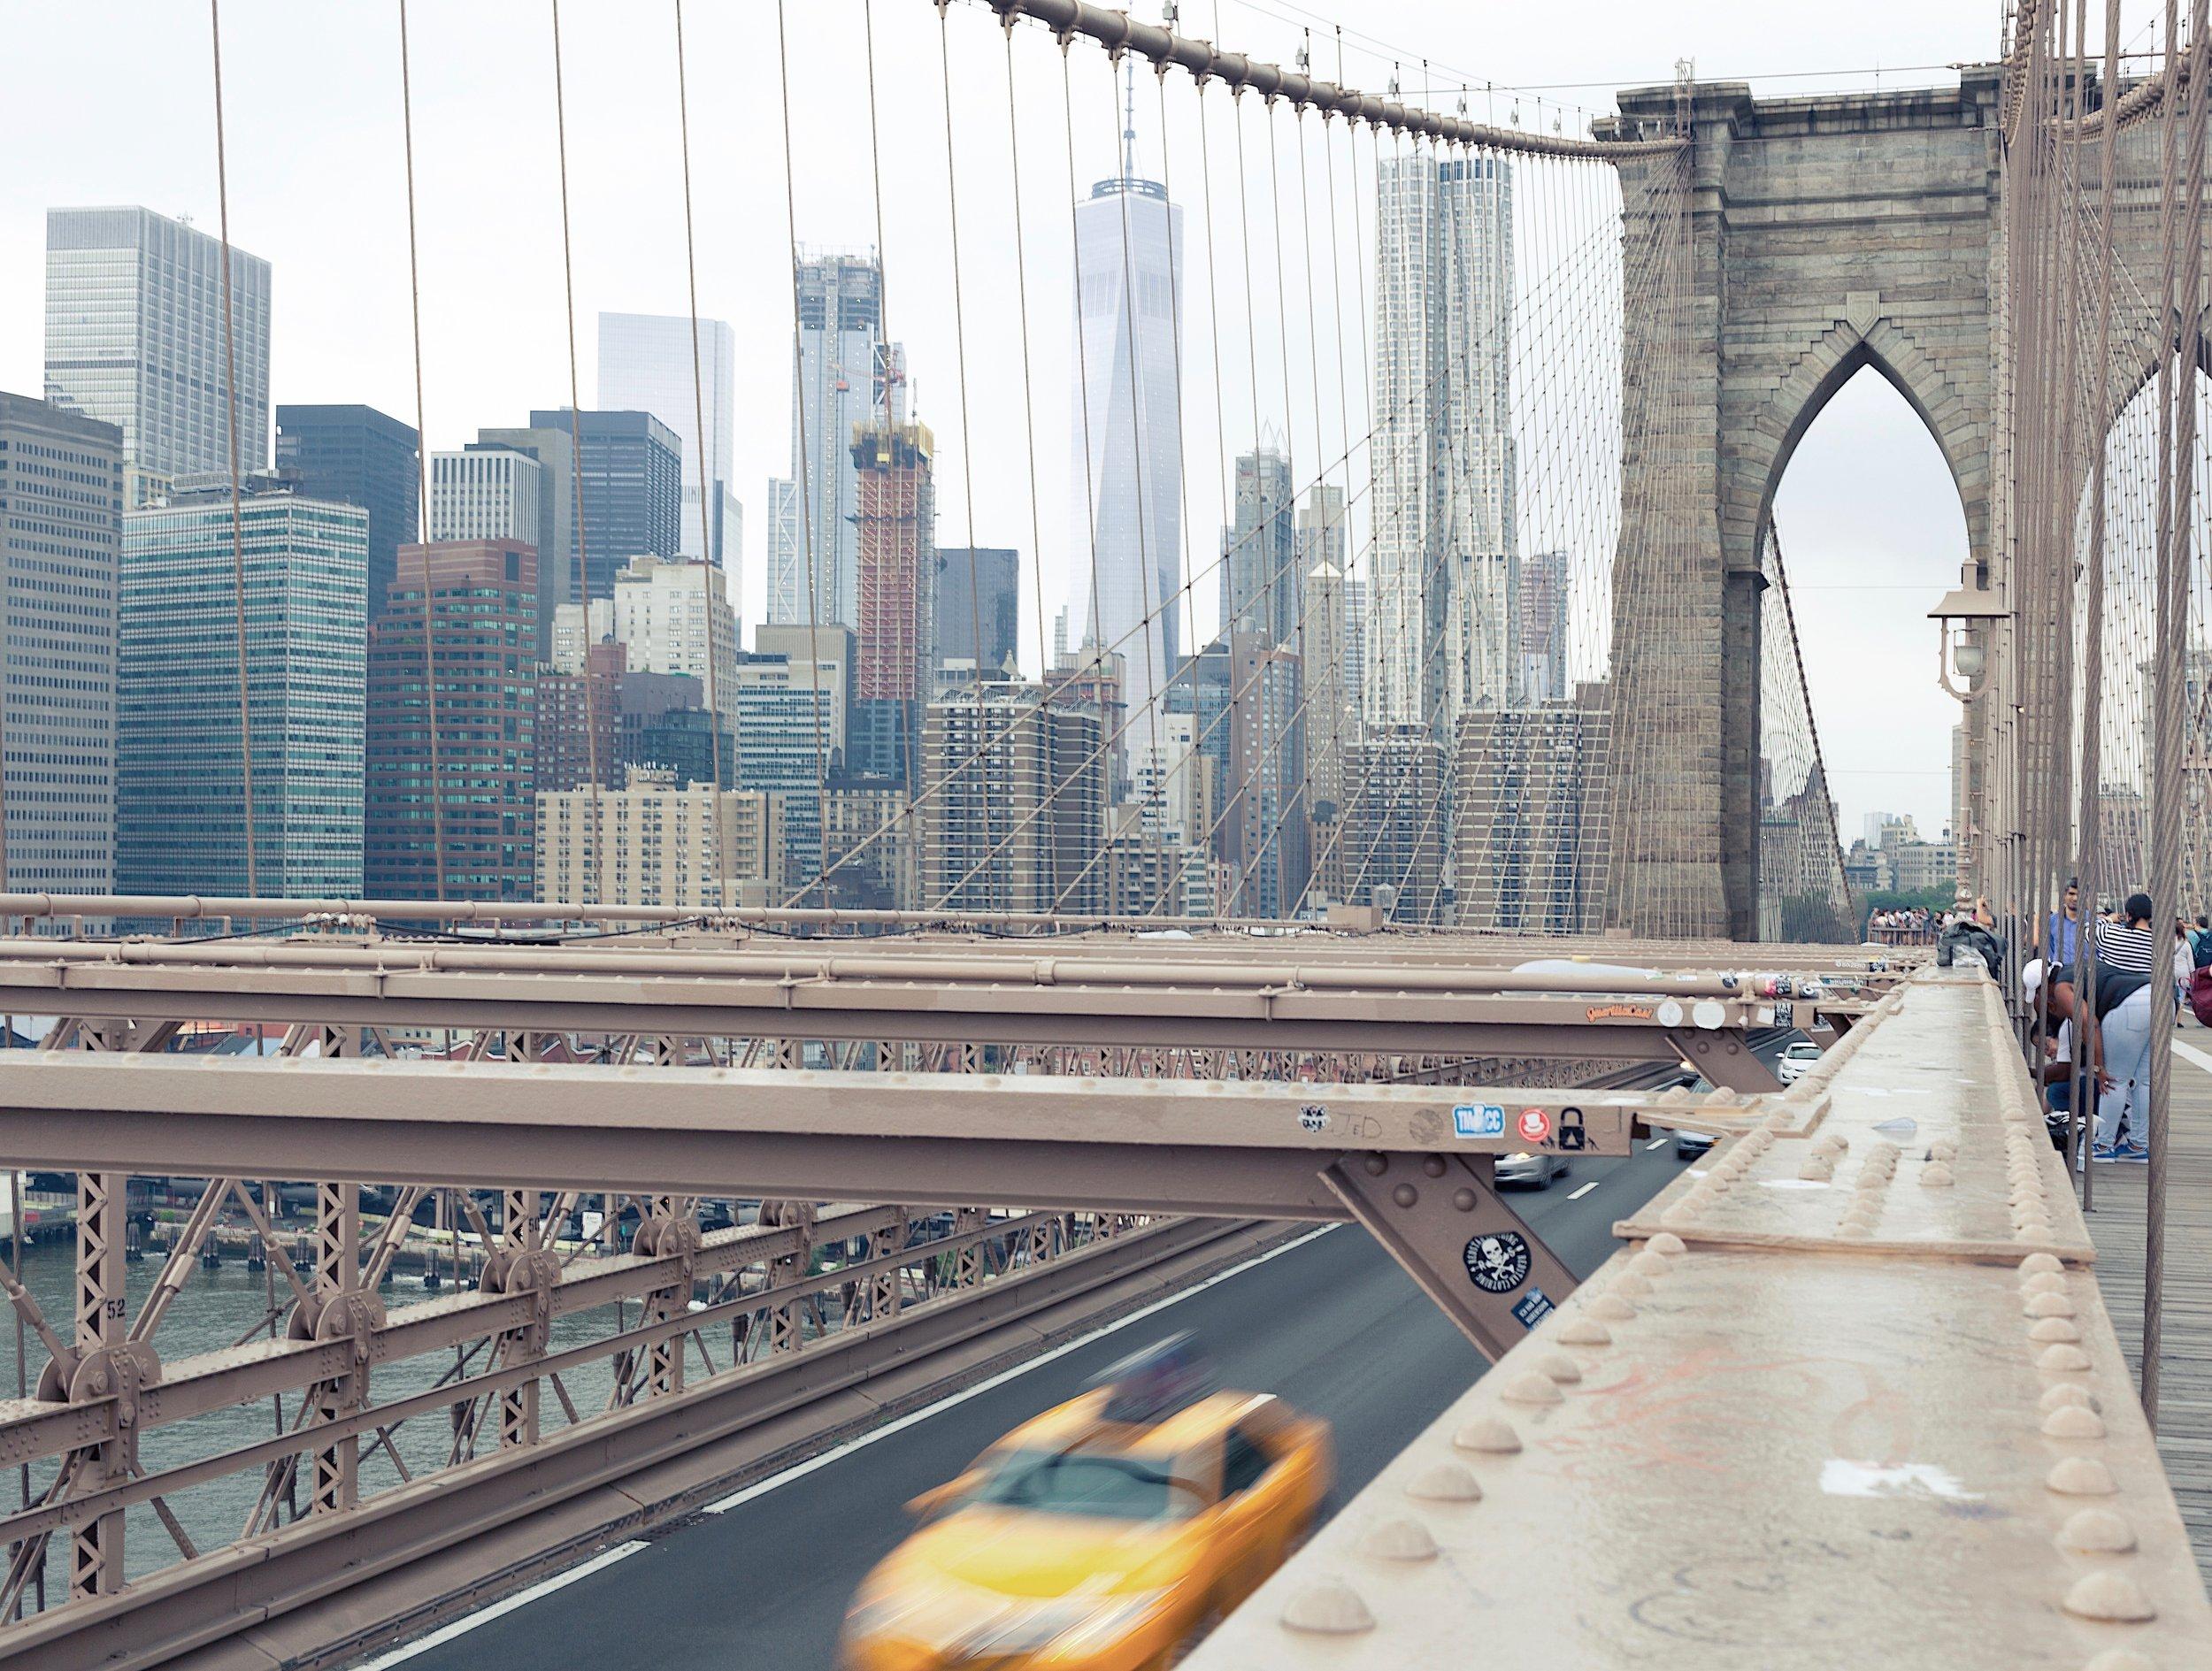 NYC-PY2.JPG